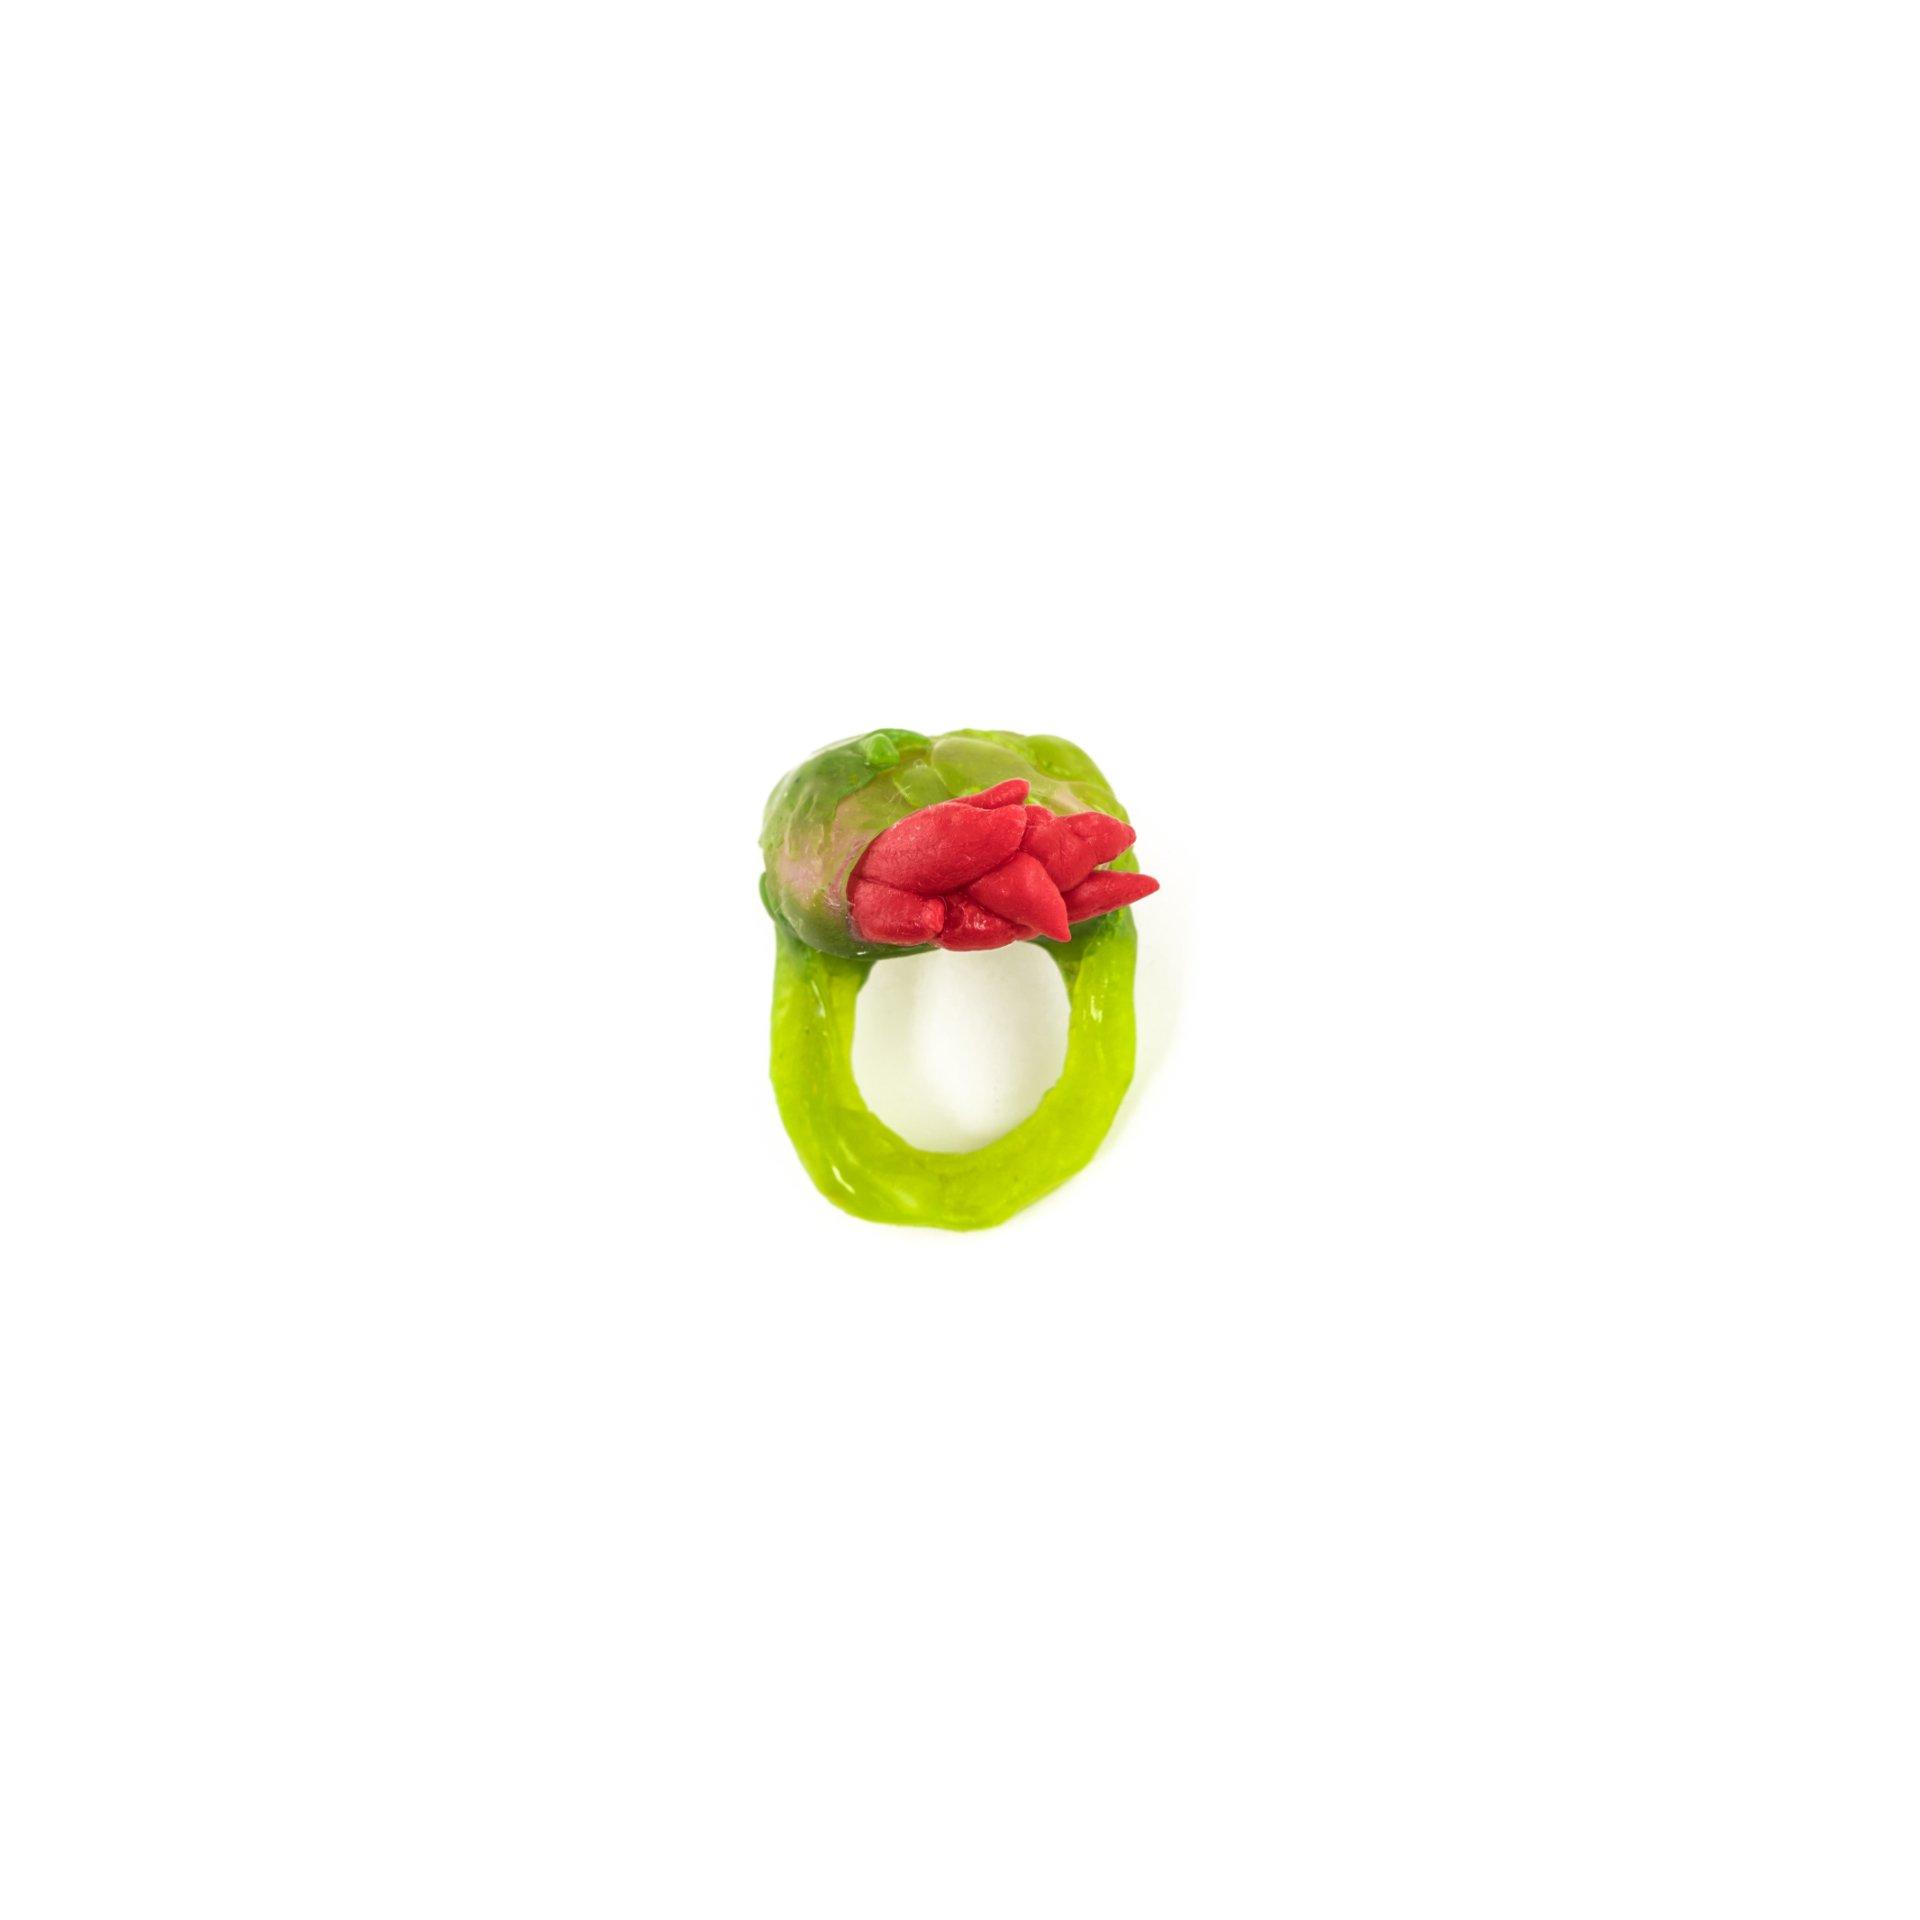 RESIN INTERMEZZO - RED & GREEN RING